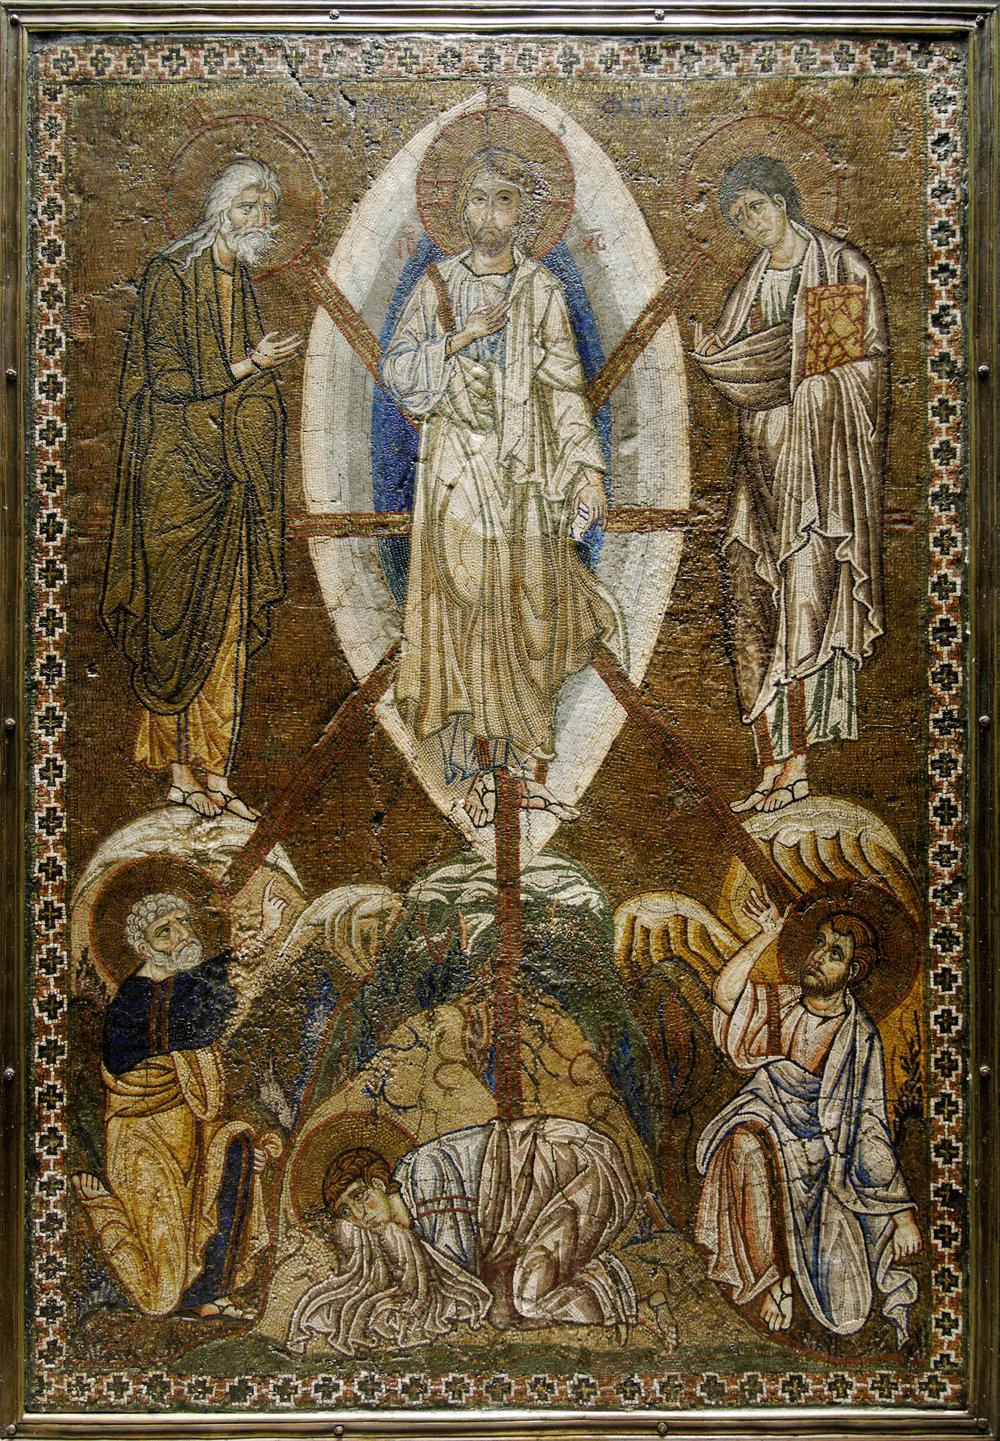 12th century Byzantine Icon, mosaic on stucco, of the Transfiguration of Christ.